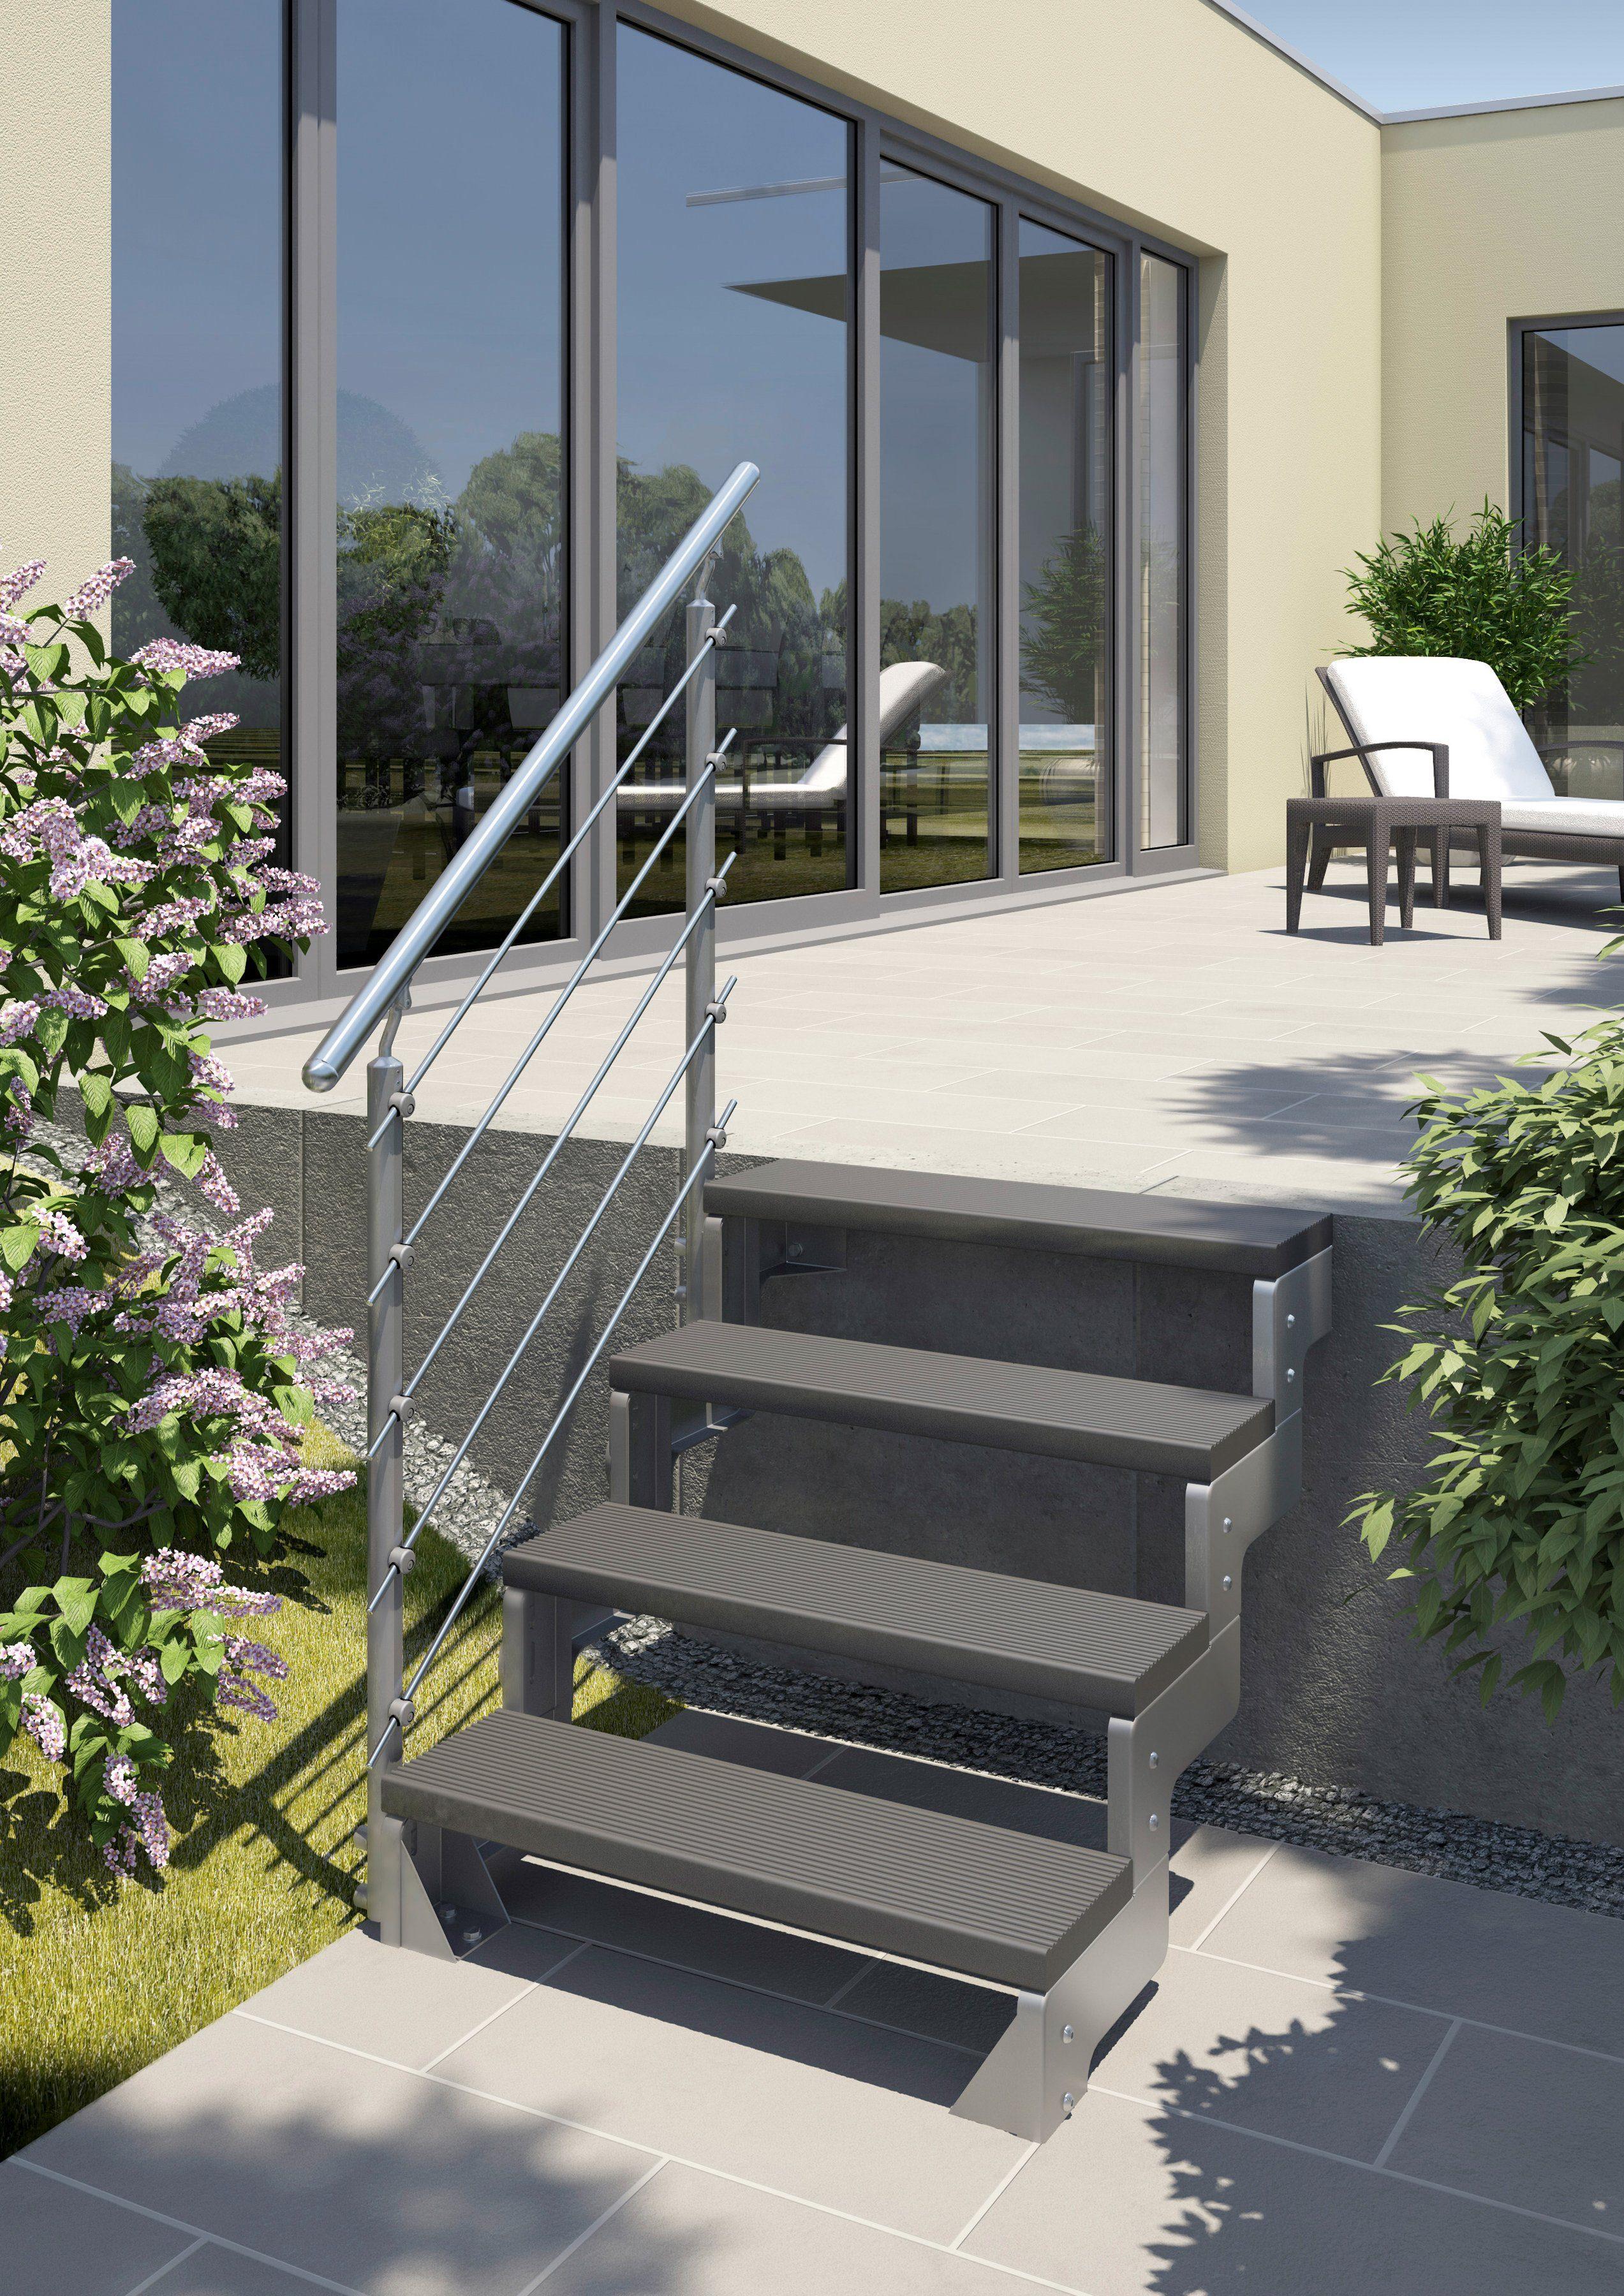 Trimaxstufe »Gardentop«, anthrazit, 80 cm Breite